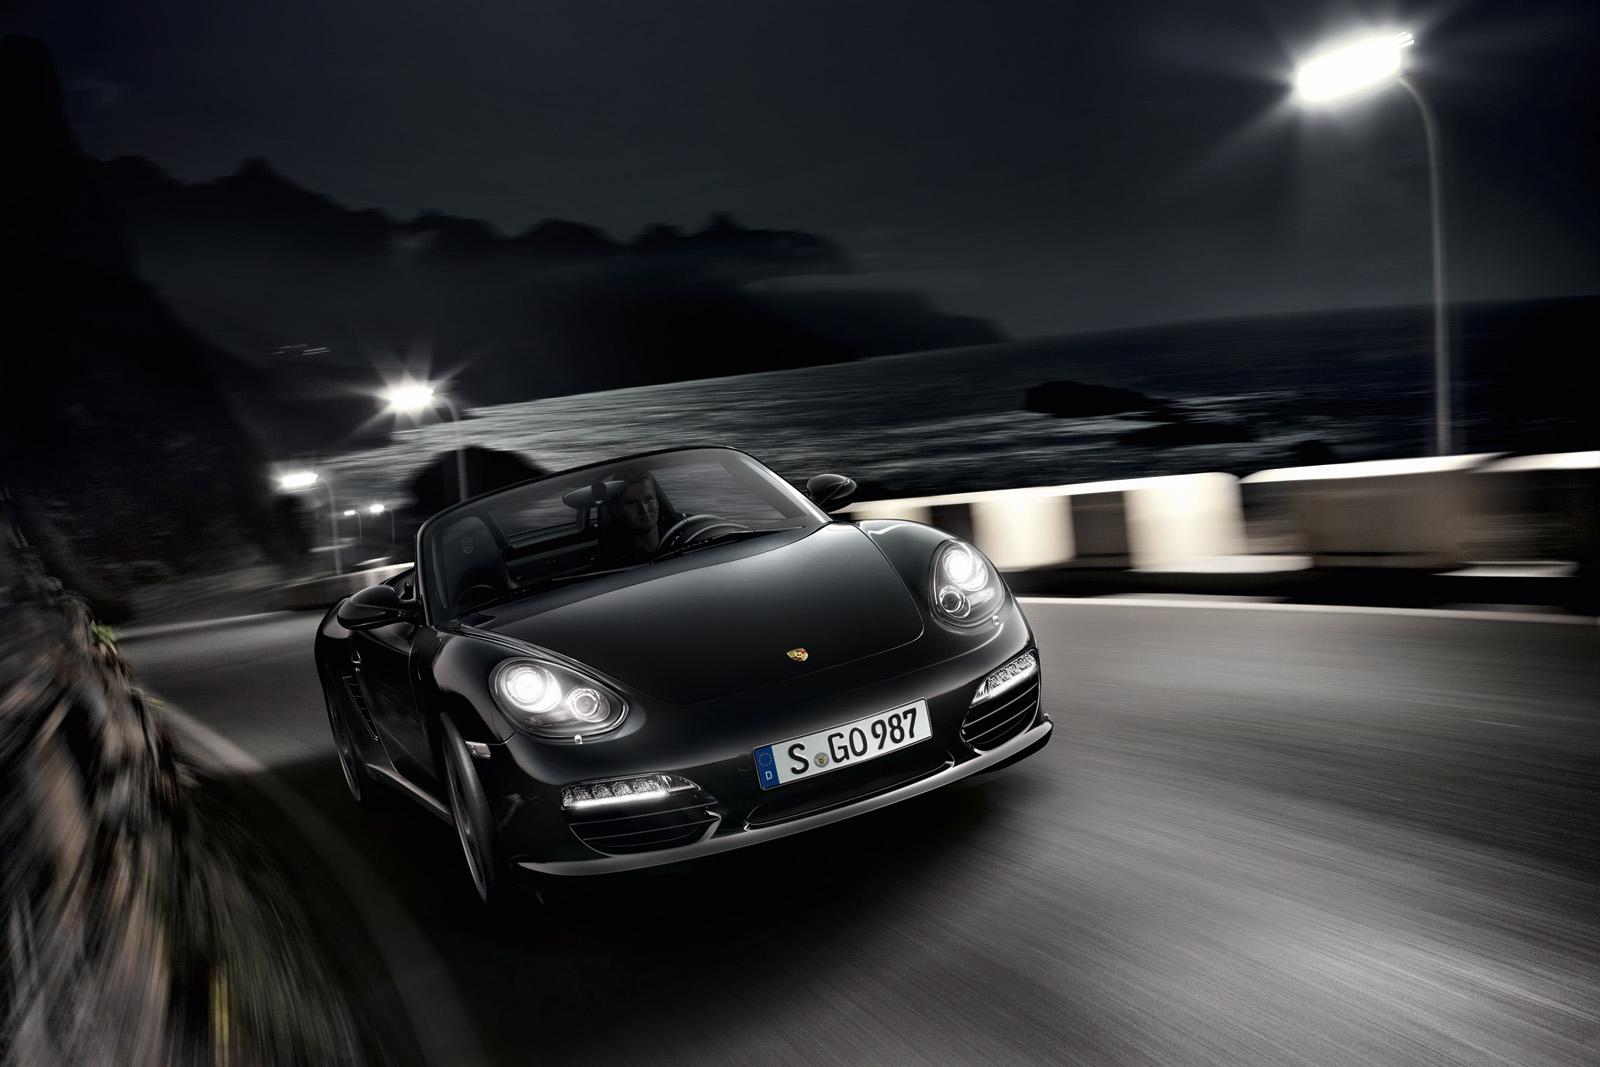 Porsche Panamera Lease >> 2011 Porsche Boxster S Black Edition Wallpapers